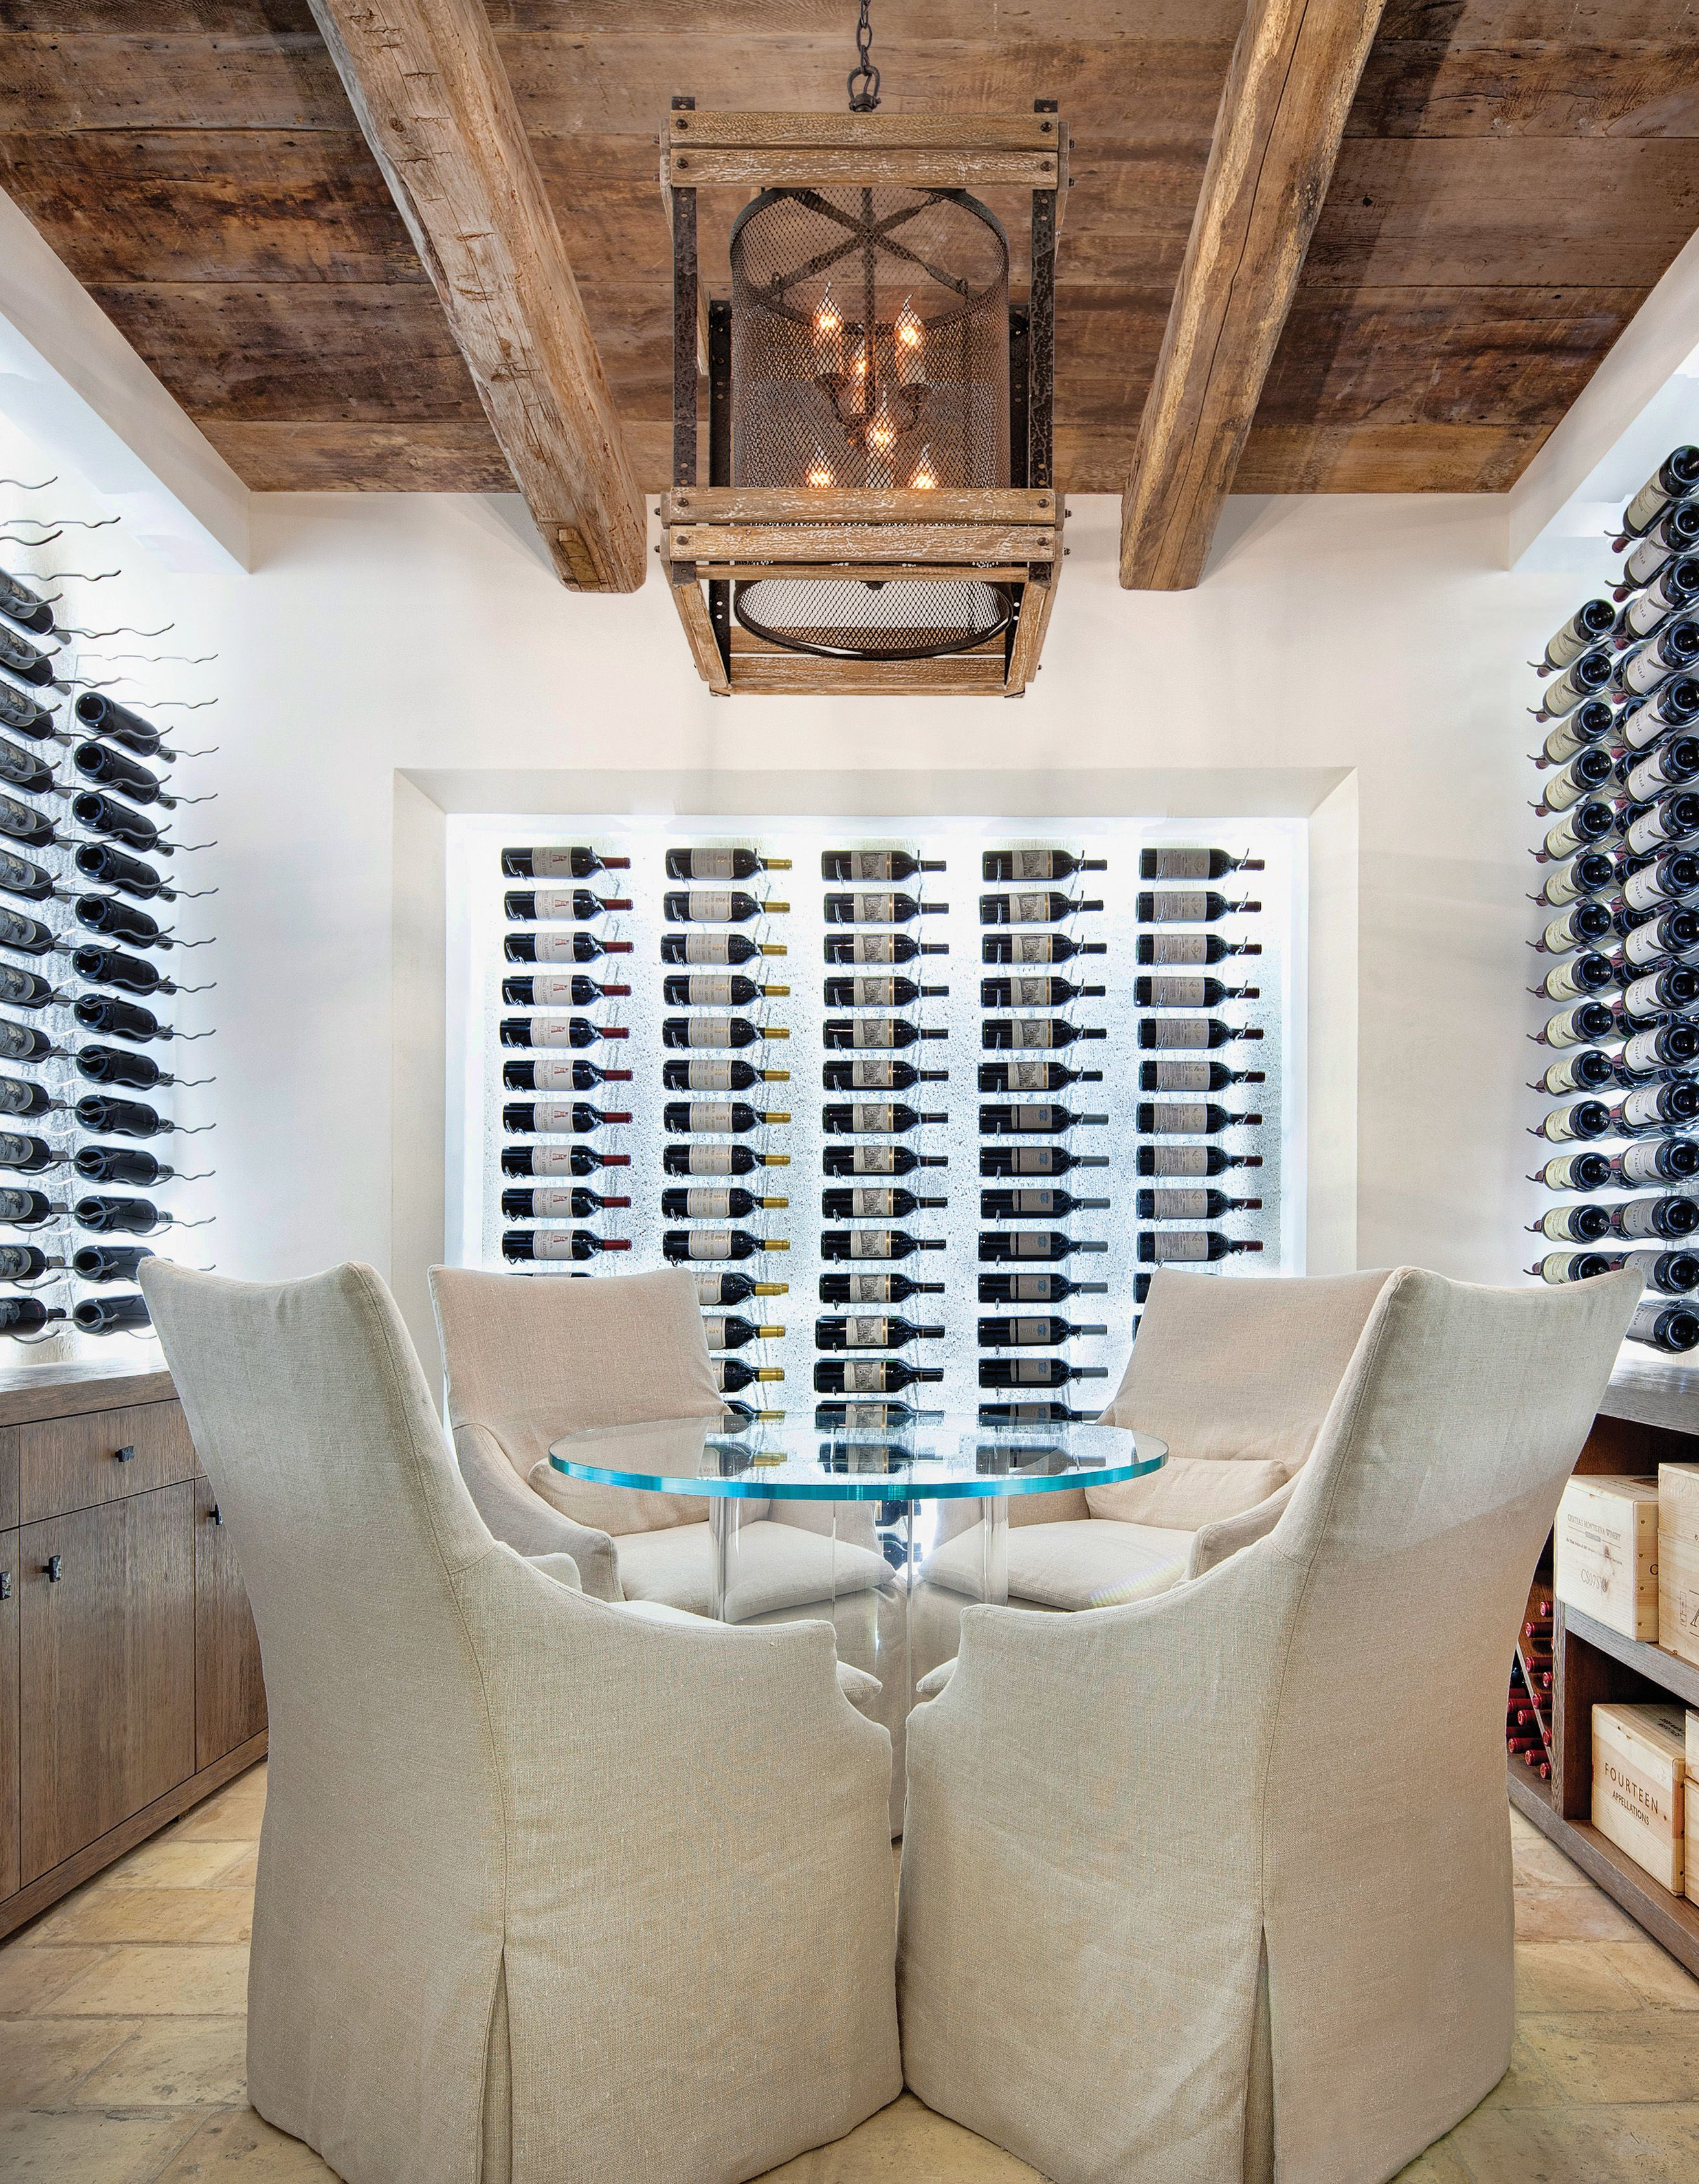 merchant street by troy lighting wine cellar pinterest cava bodegas y barra de bar. Black Bedroom Furniture Sets. Home Design Ideas